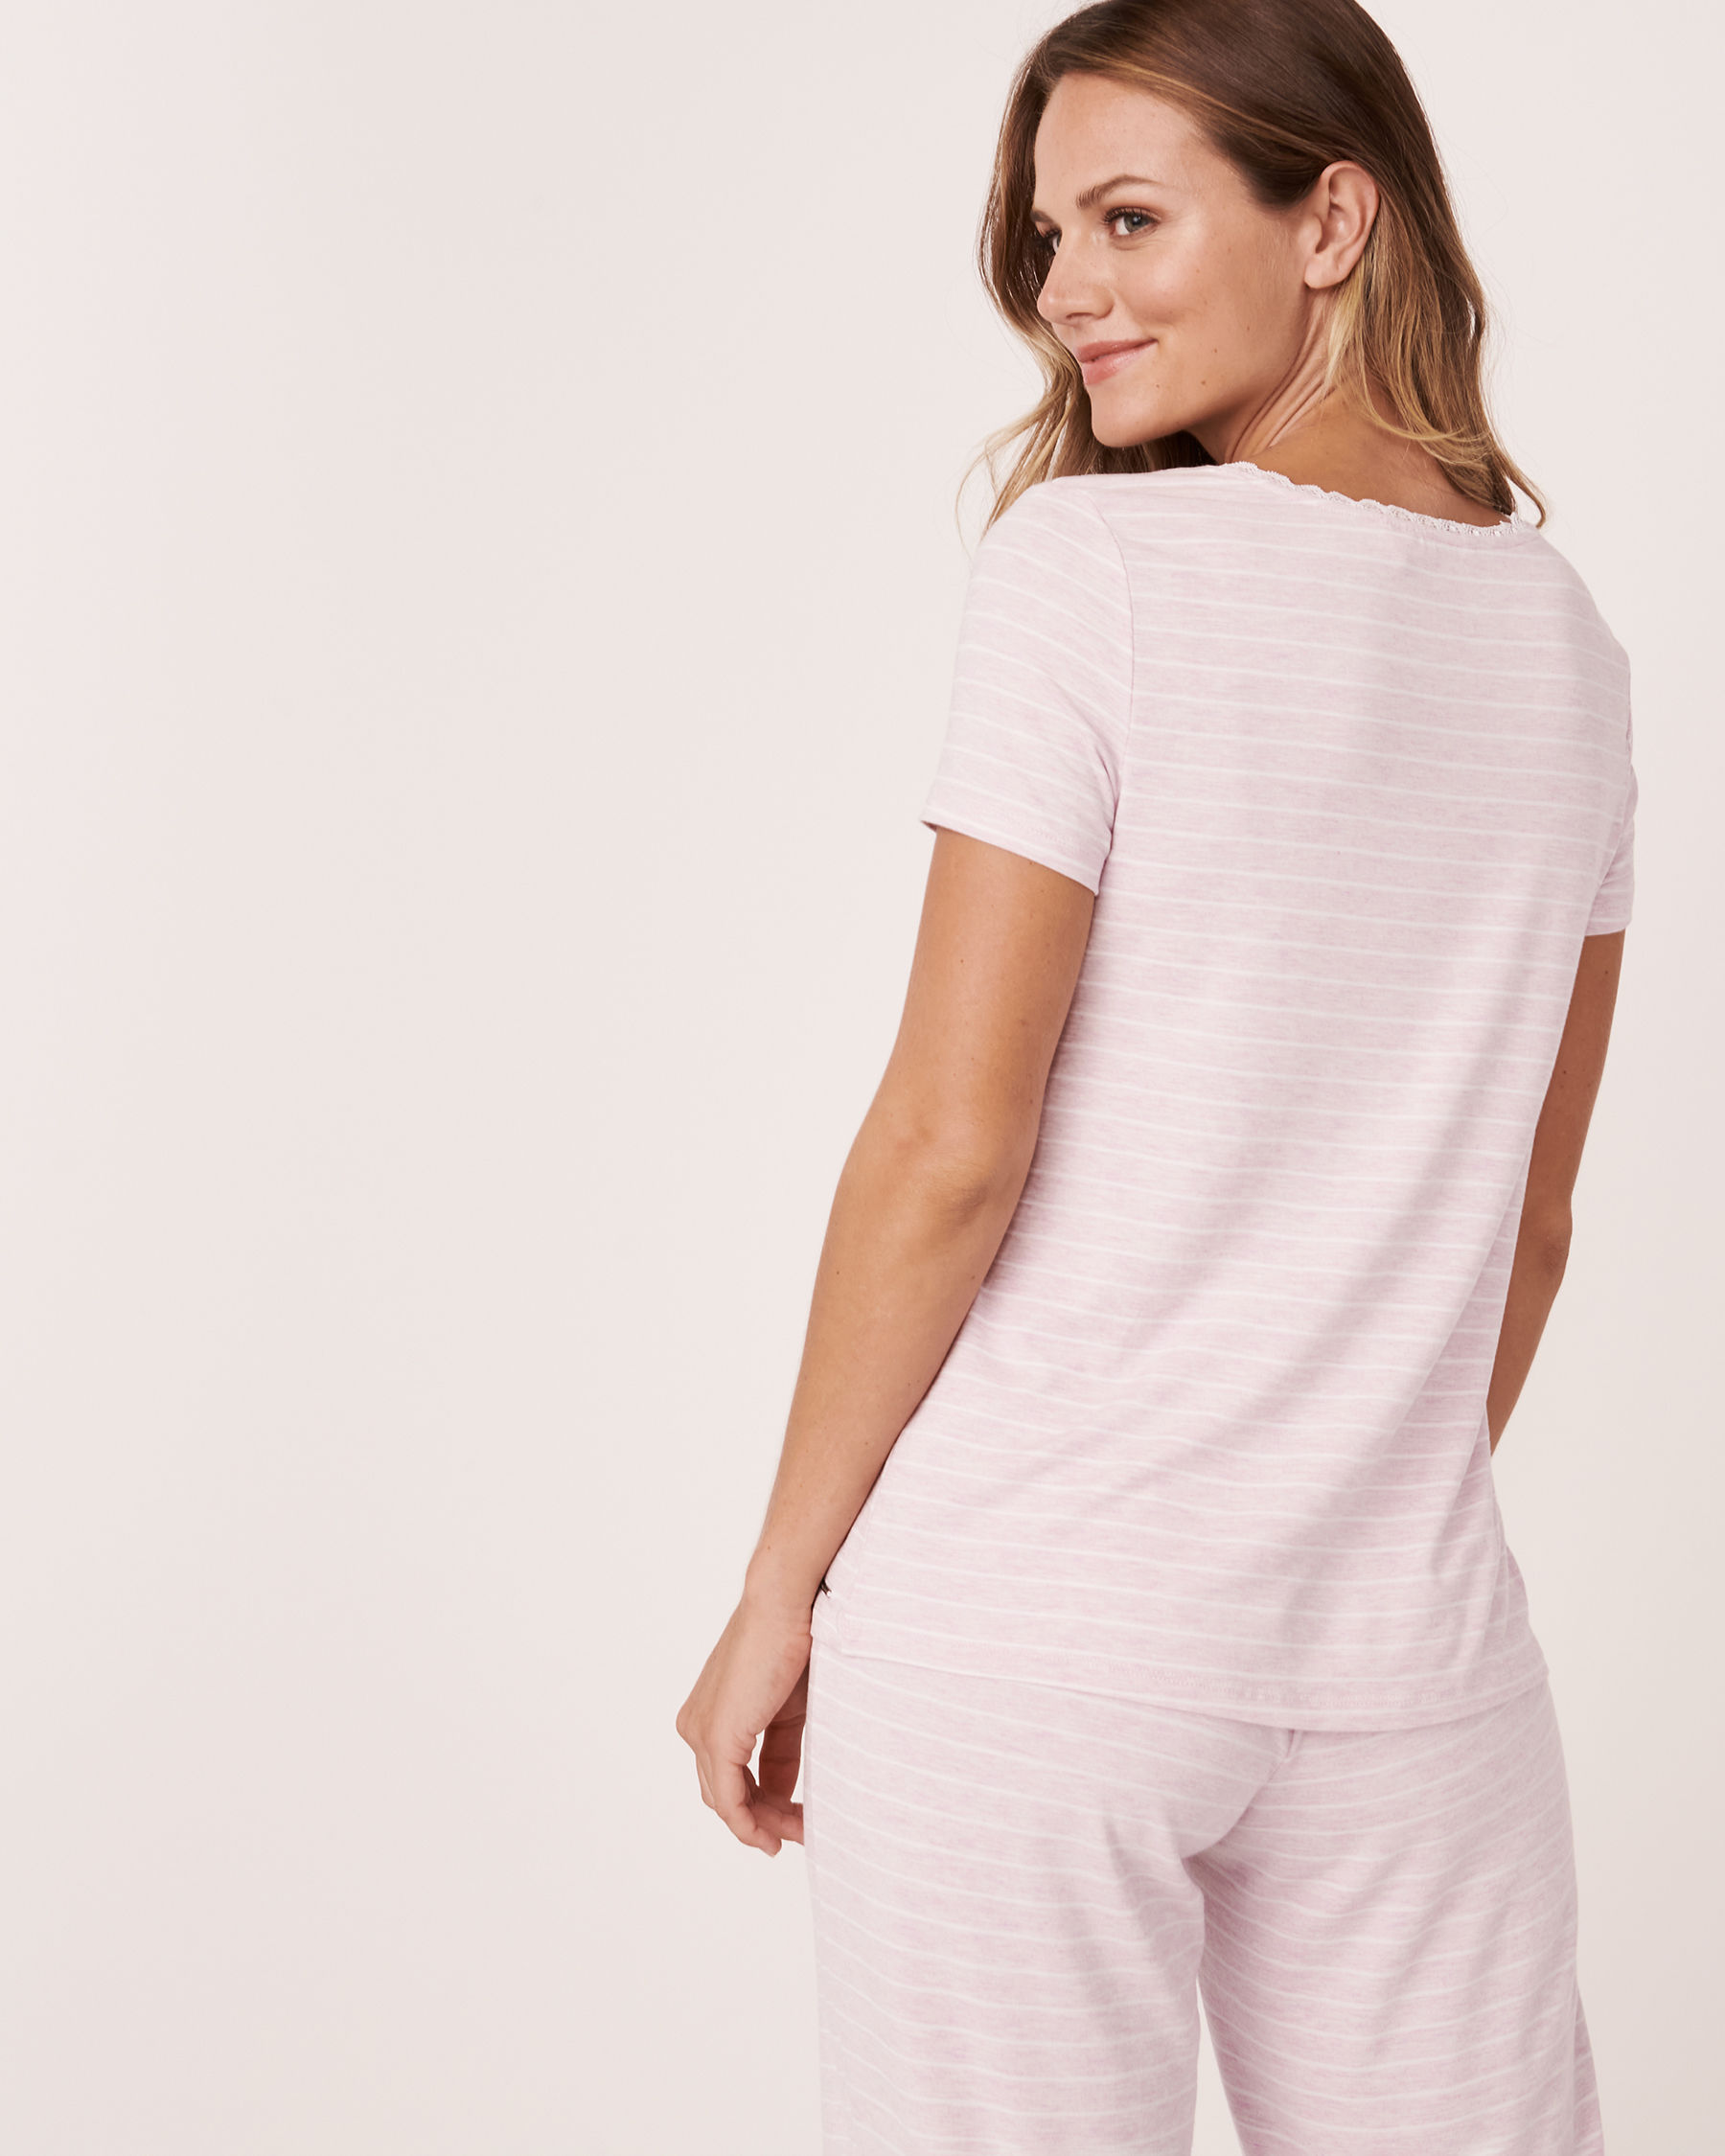 LA VIE EN ROSE Henley T-shirt Stripes 50100008 - View2